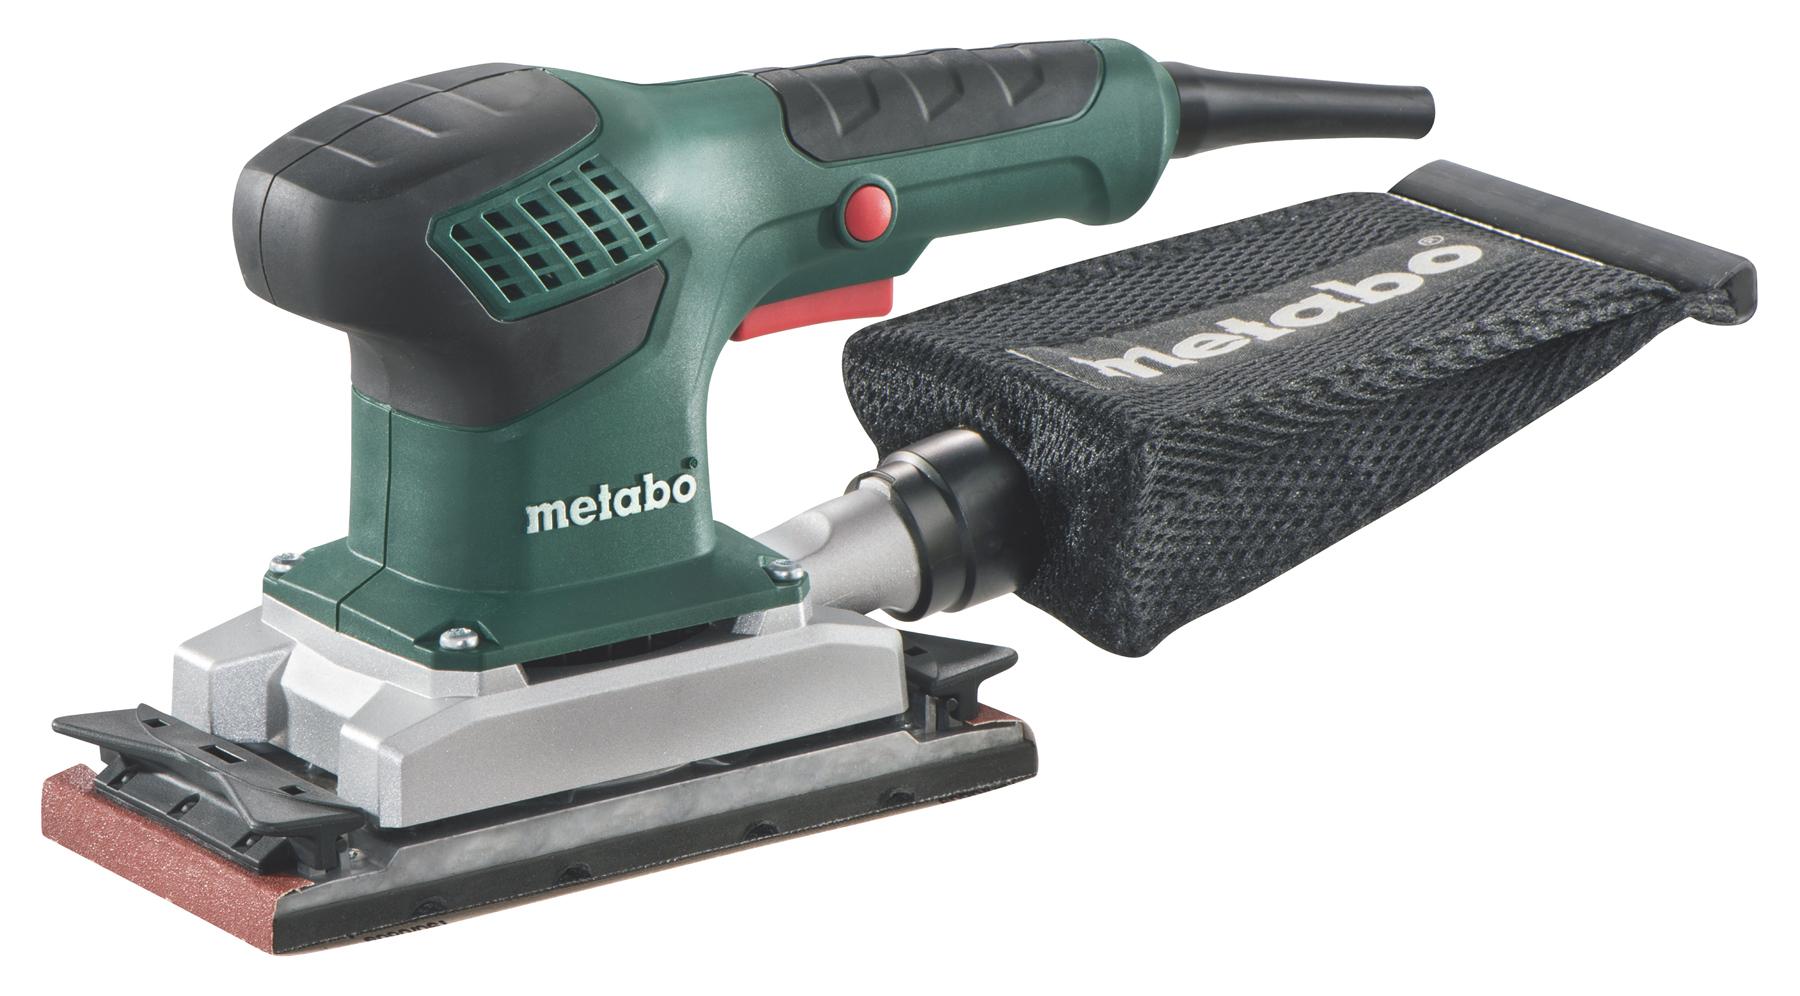 Metabo SR 2185 (600441500) - ������������������ ������ (Green)